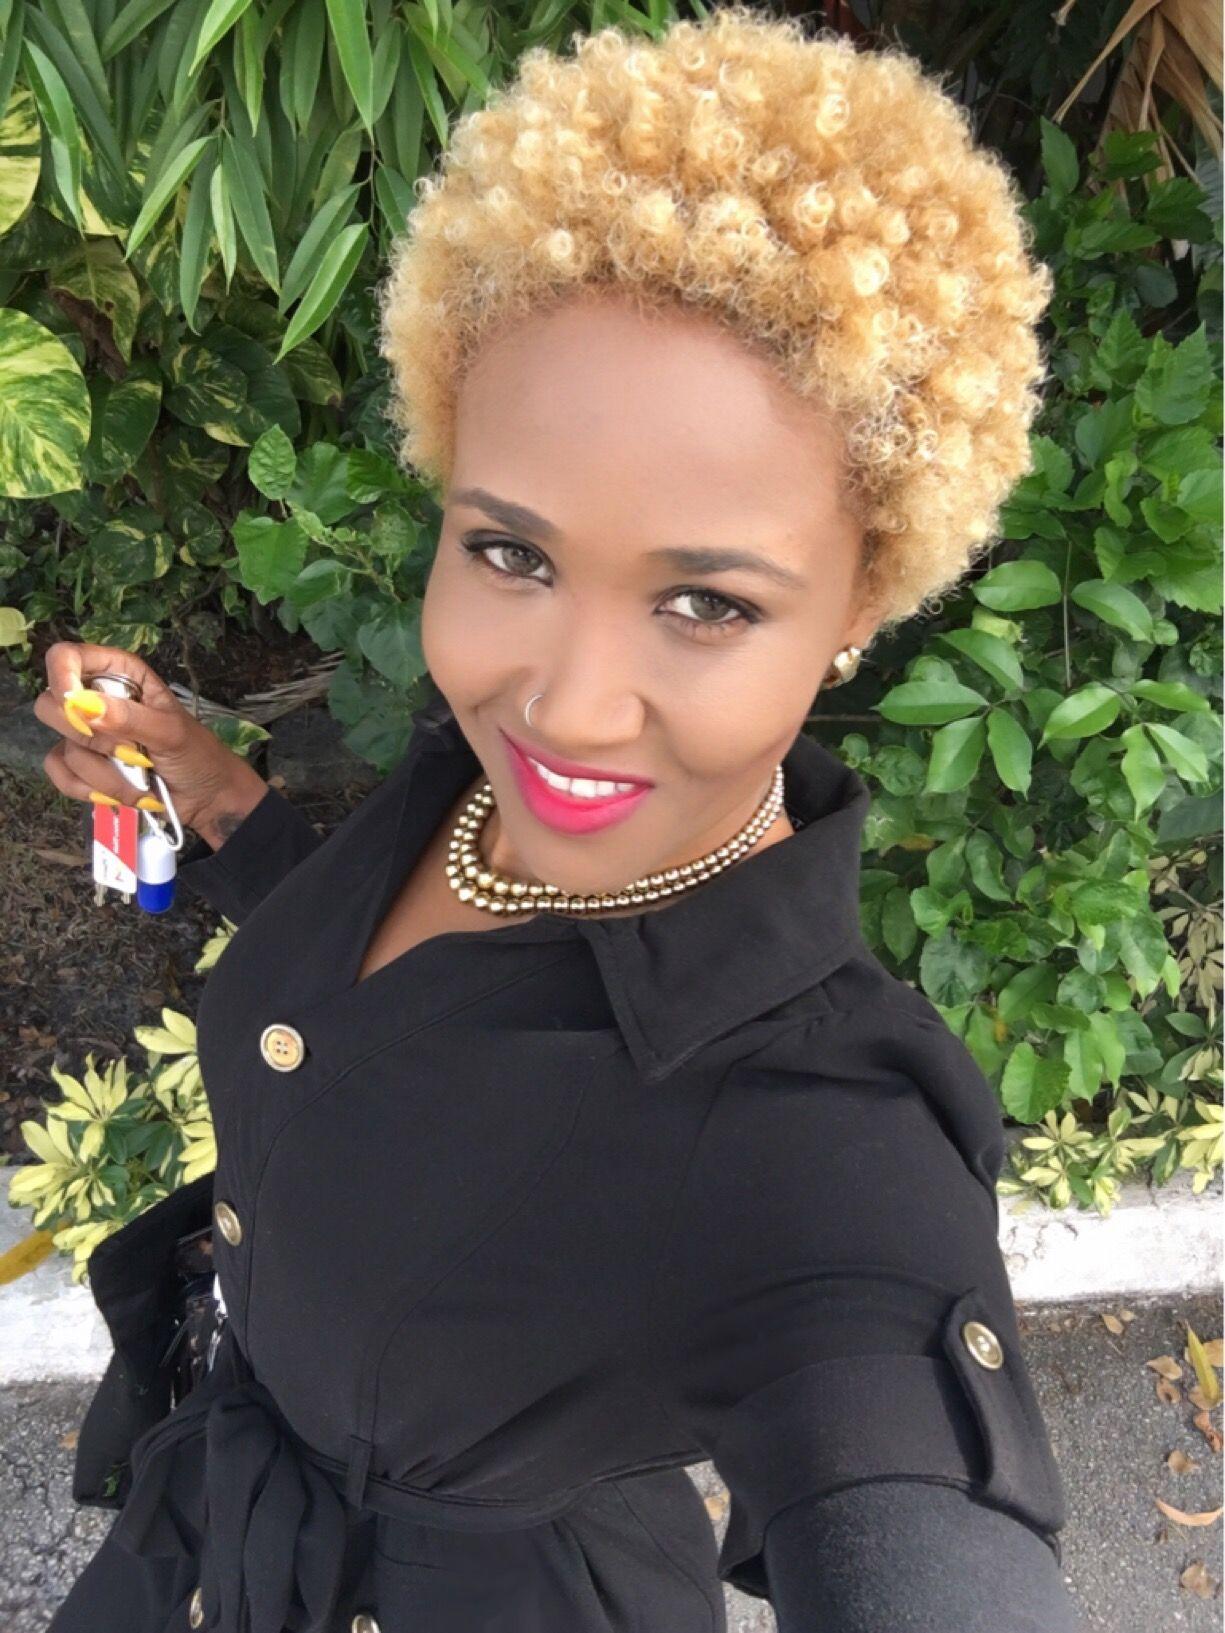 blonde curly fro haitian beauty guertie nestor natural